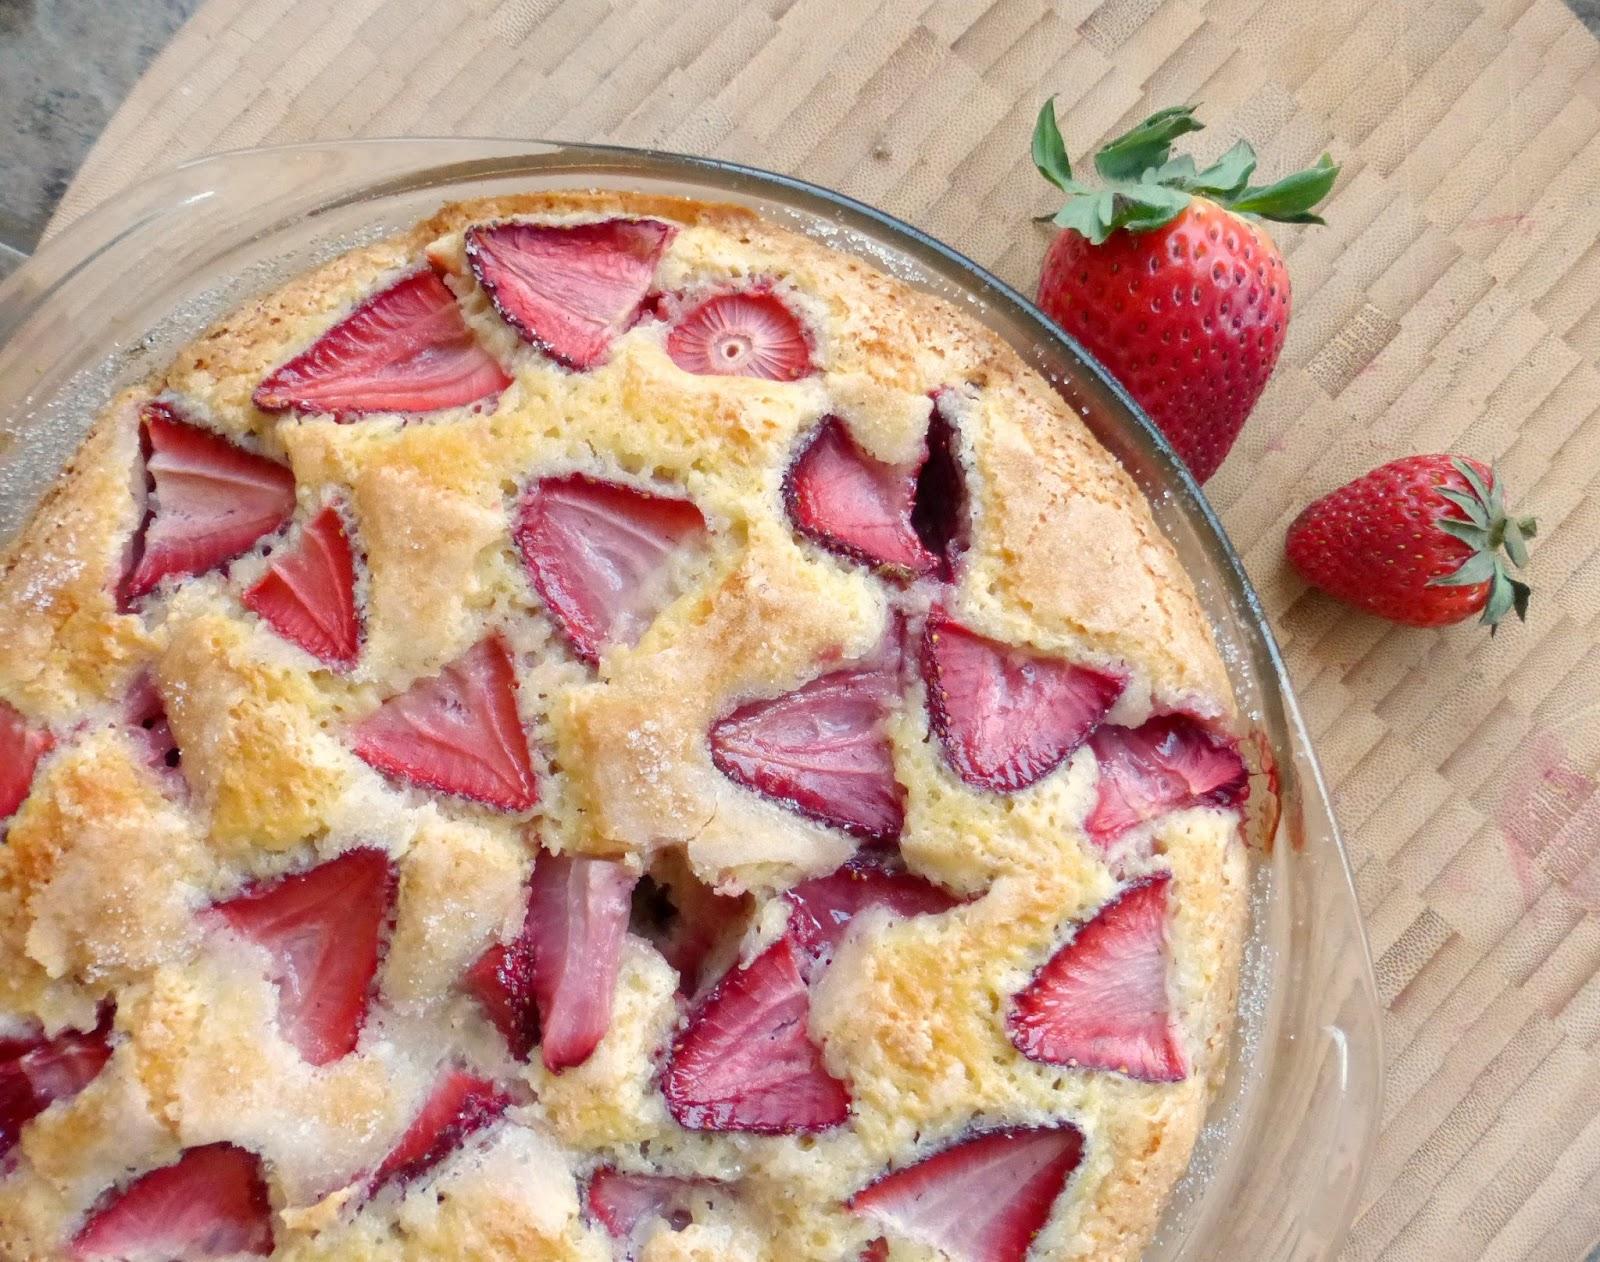 http://www.tillamook.com/recipes/low-fat-strawberry-coffee-cake.html